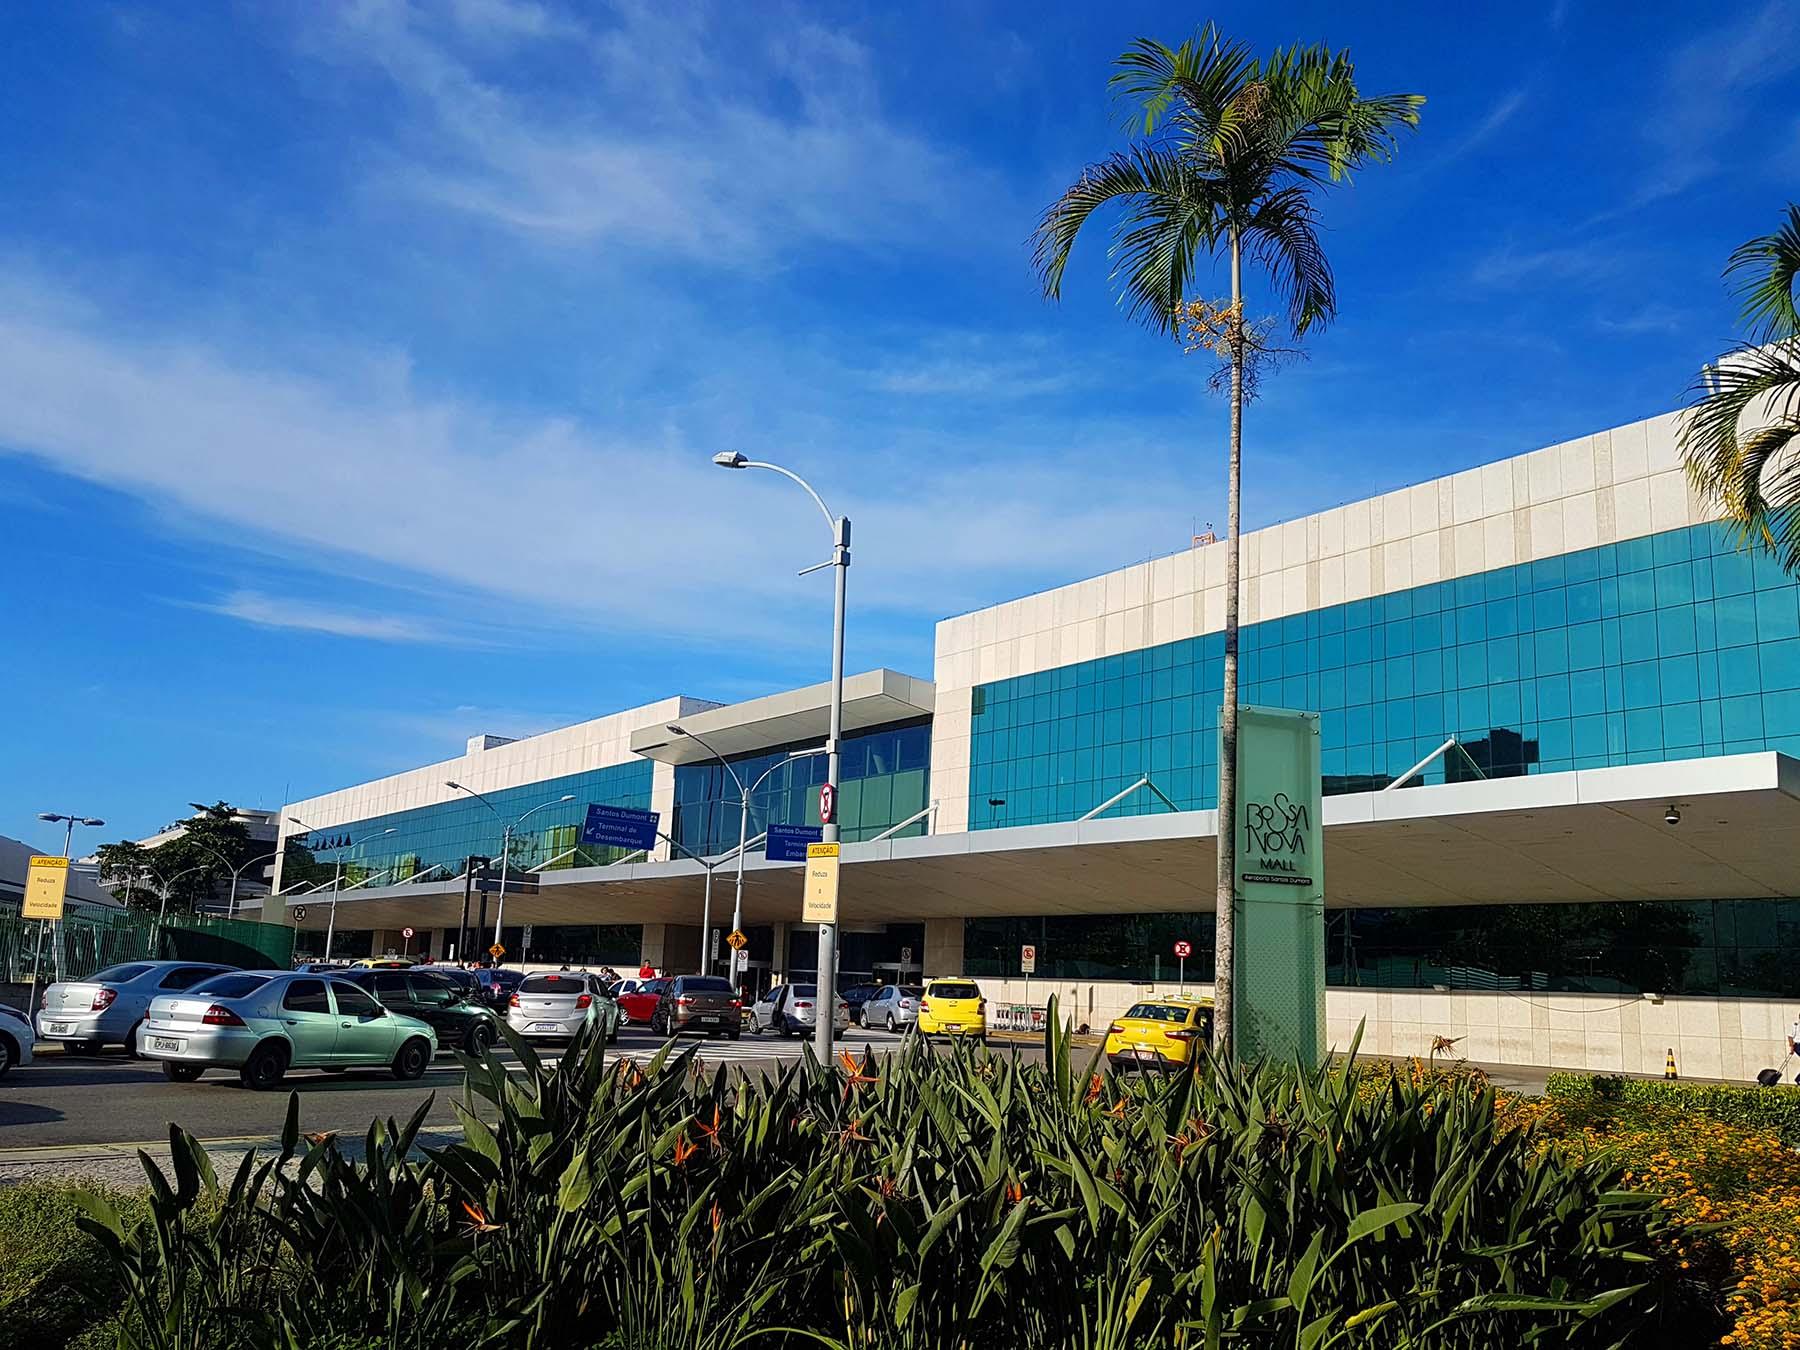 Aeroporto Santos Dumont no Rio de Janeiro.